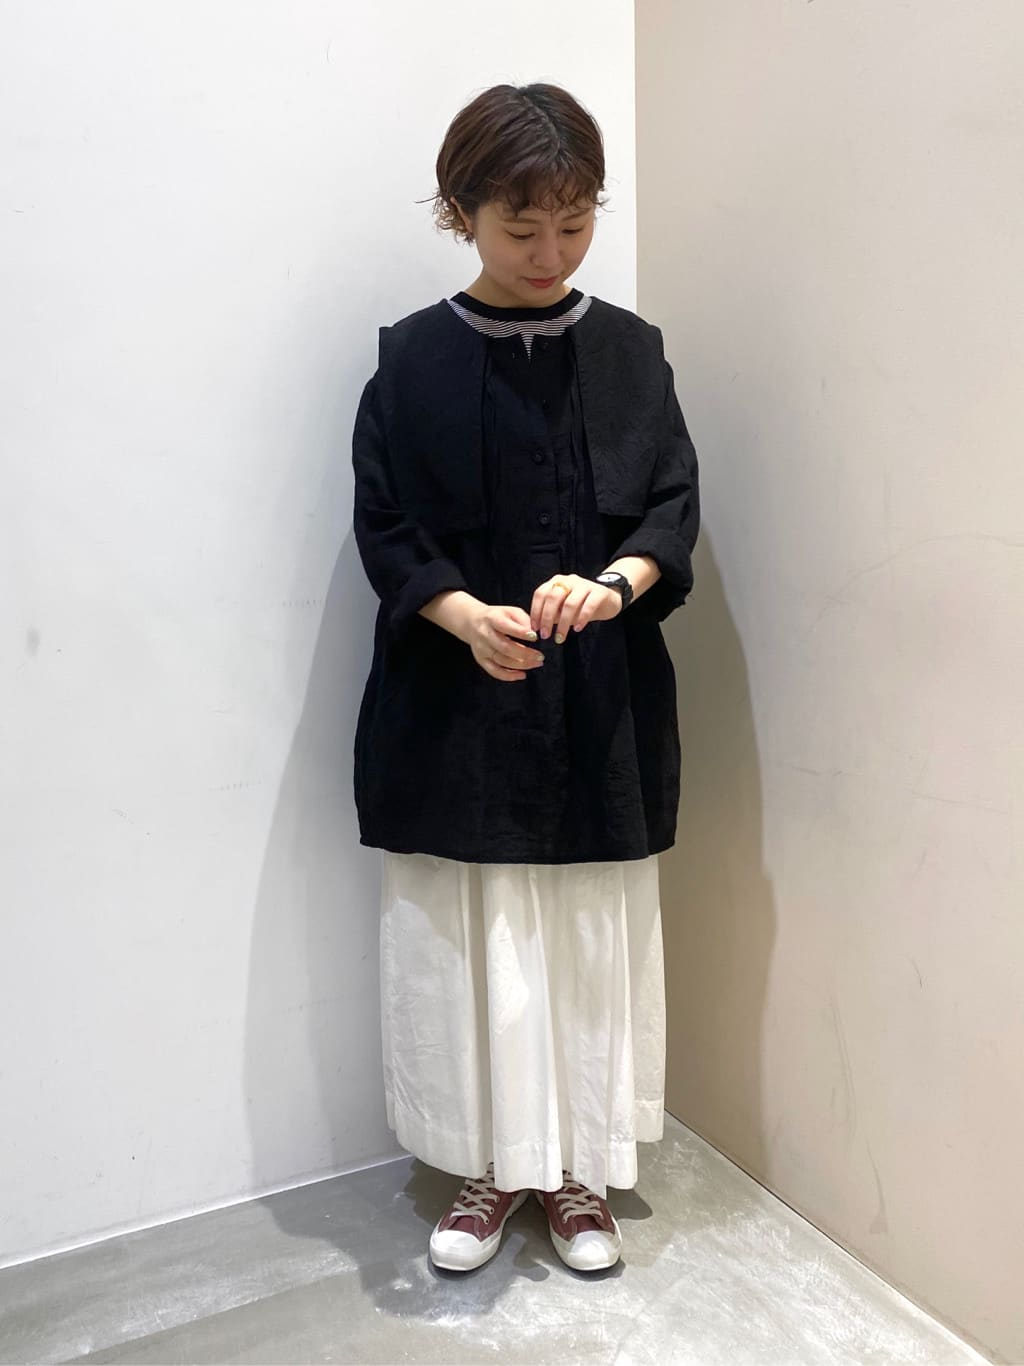 bulle de savon 阪急西宮ガーデンズ 身長:149cm 2021.08.12